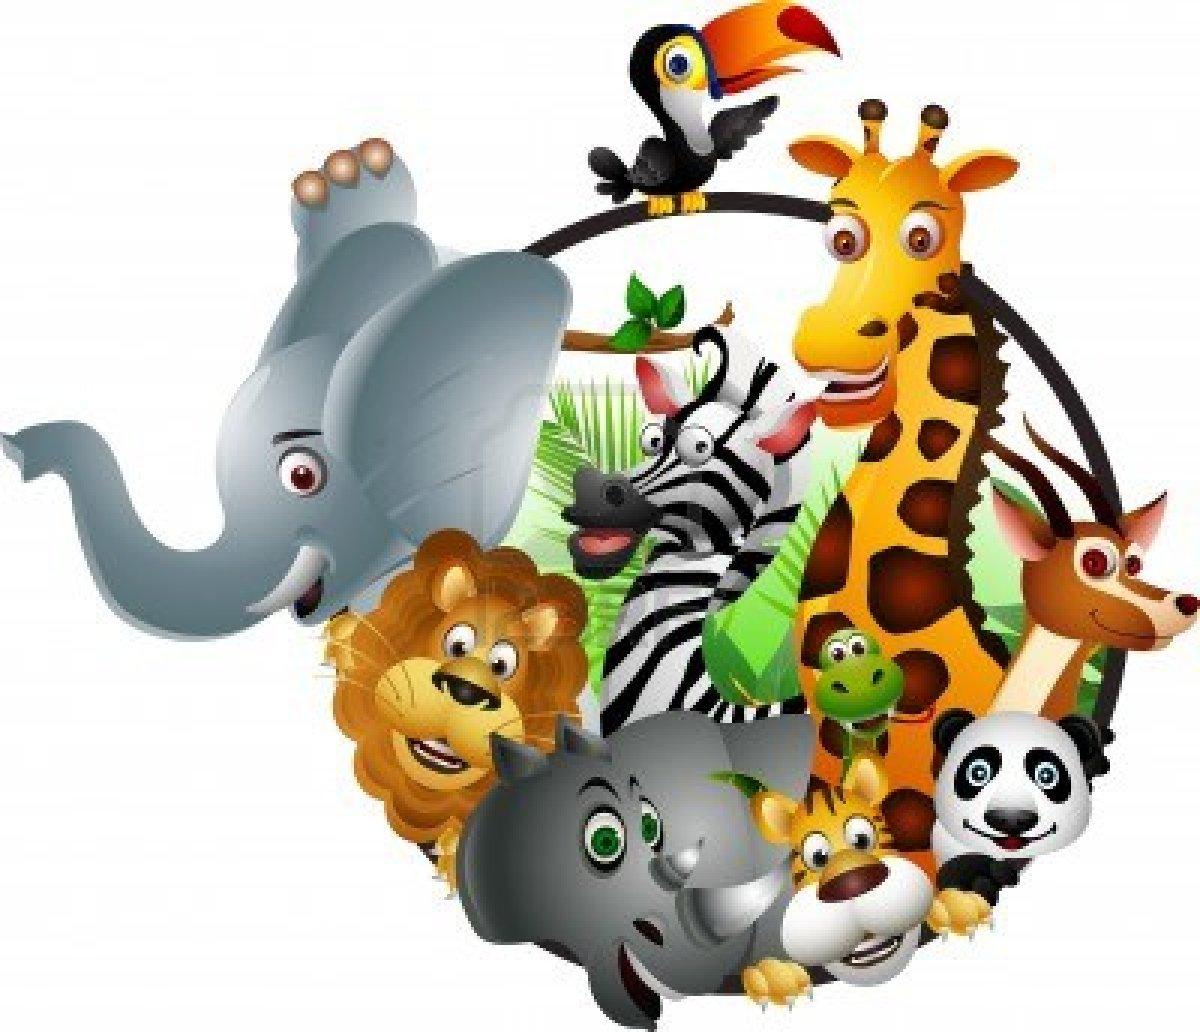 http://raquelramonceu.wix.com/animales-wild#